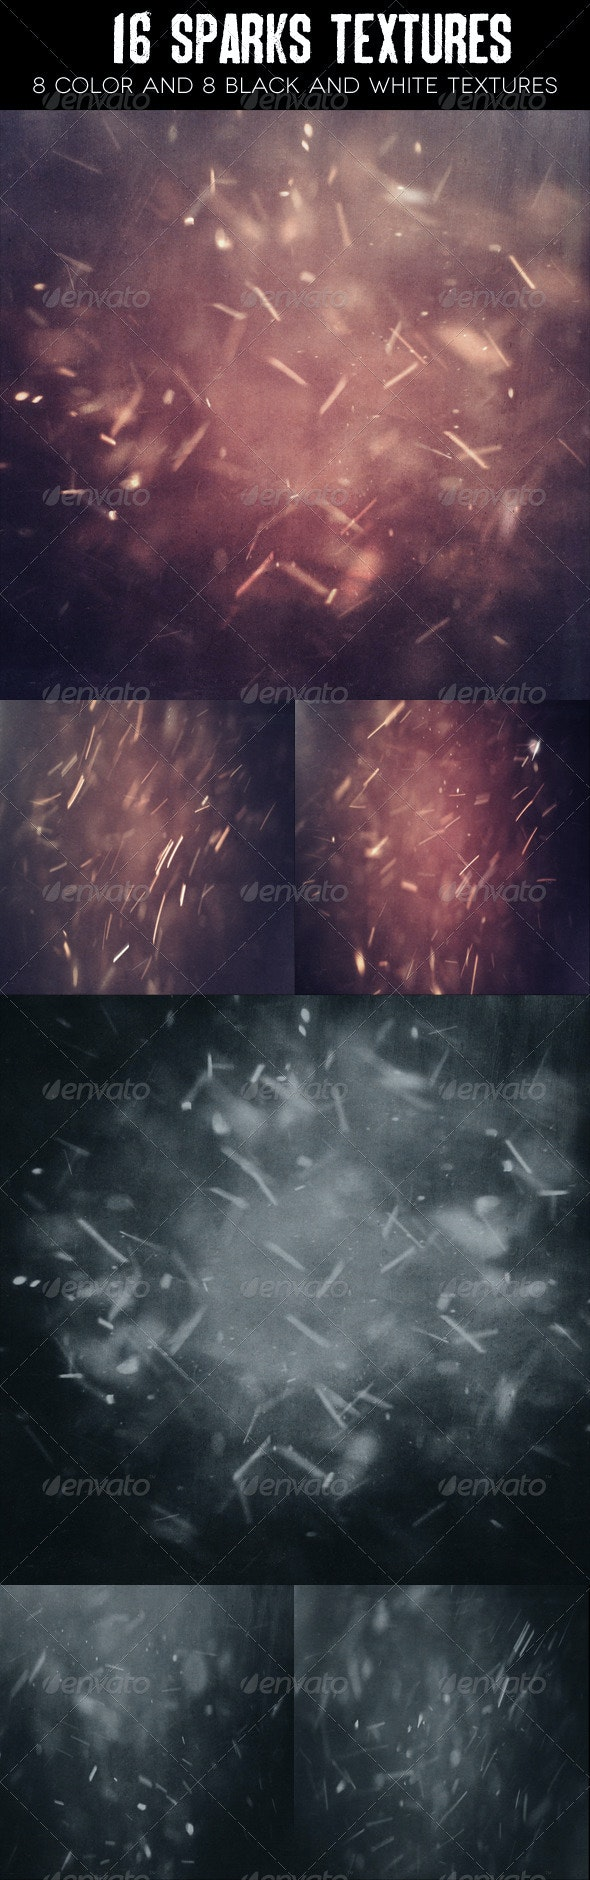 16 Sparks Textures - Industrial / Grunge Textures